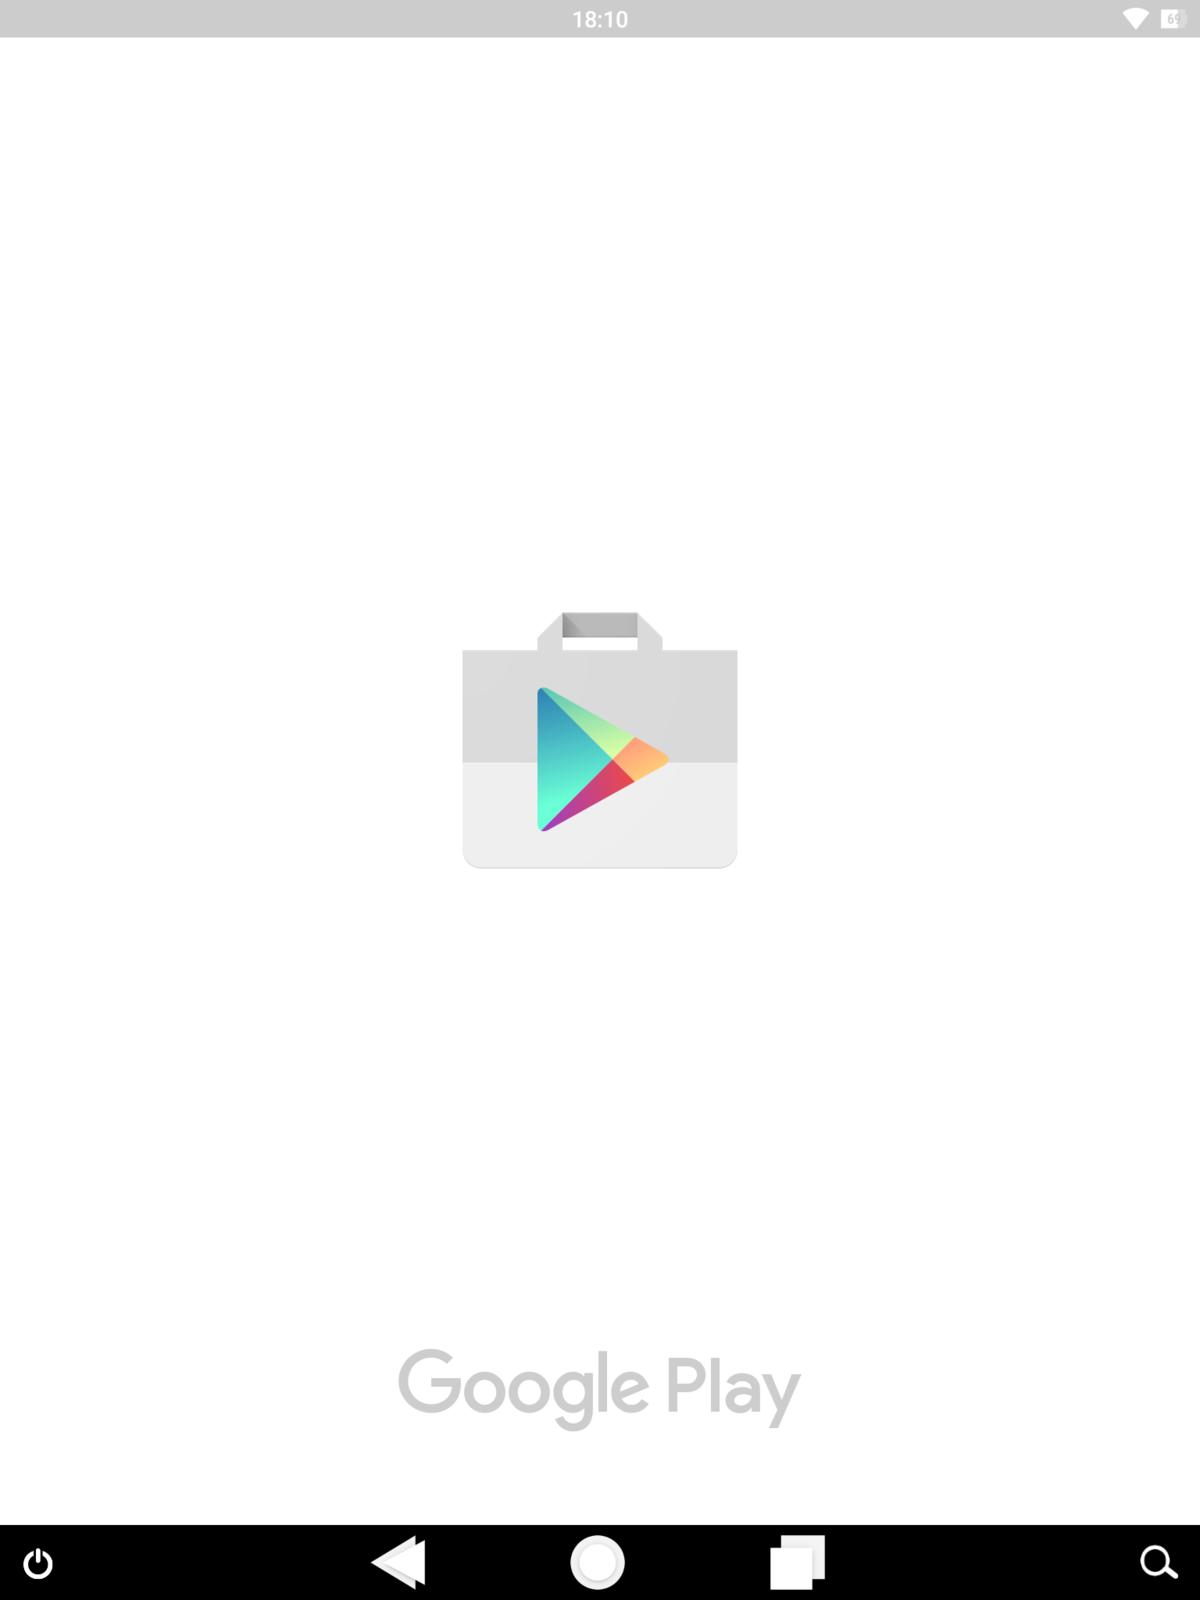 Screenshot_20151117-181108.png